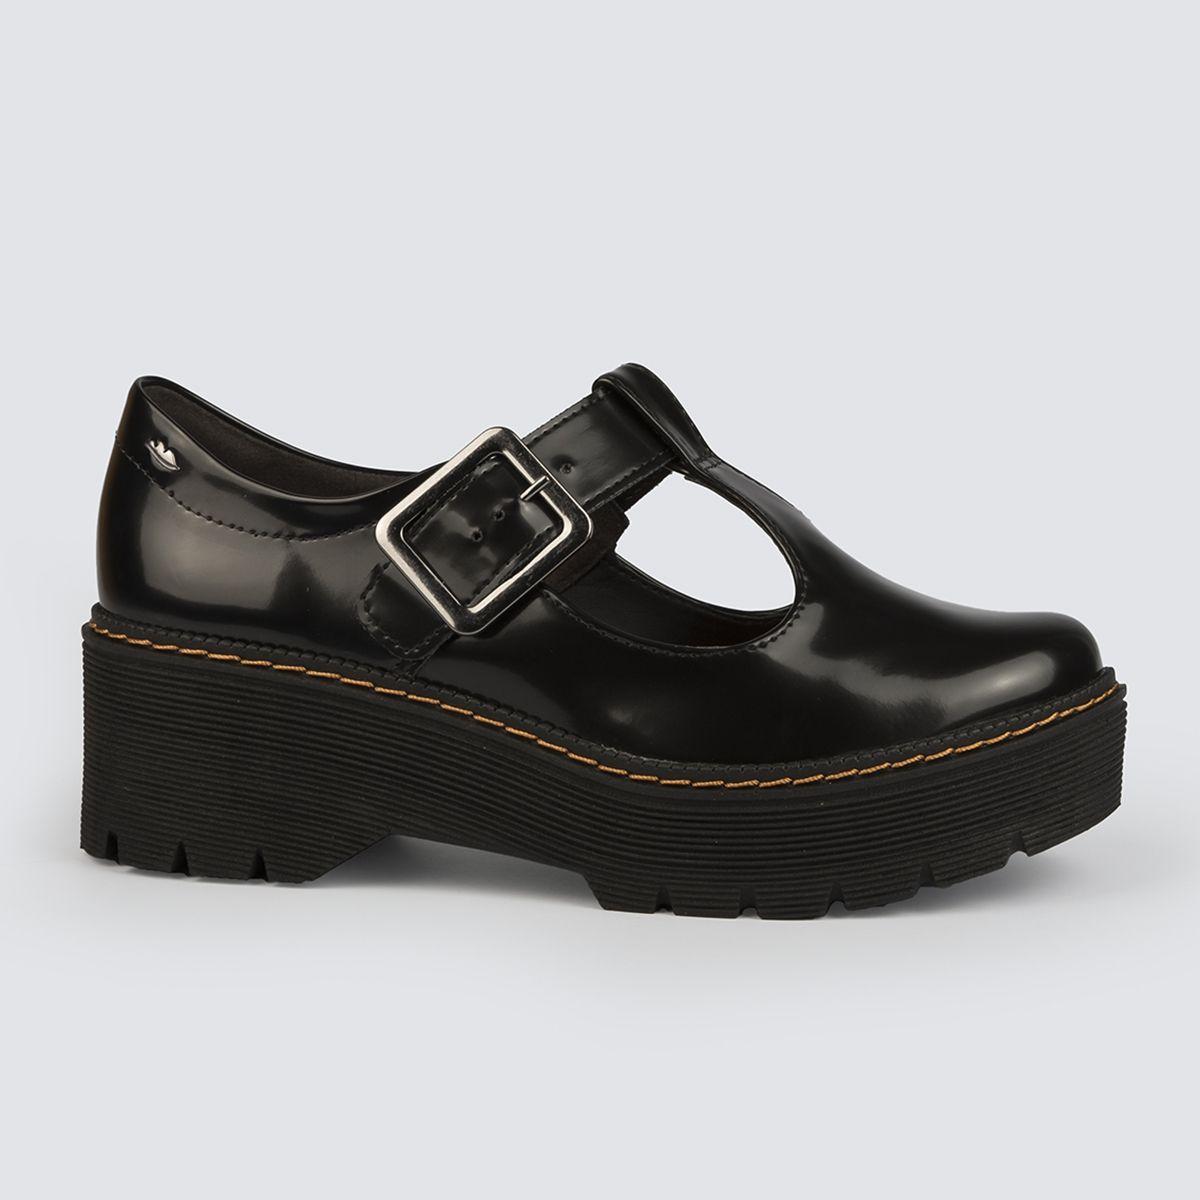 Sapato Dakota Oxford Flatform Fivela G2571